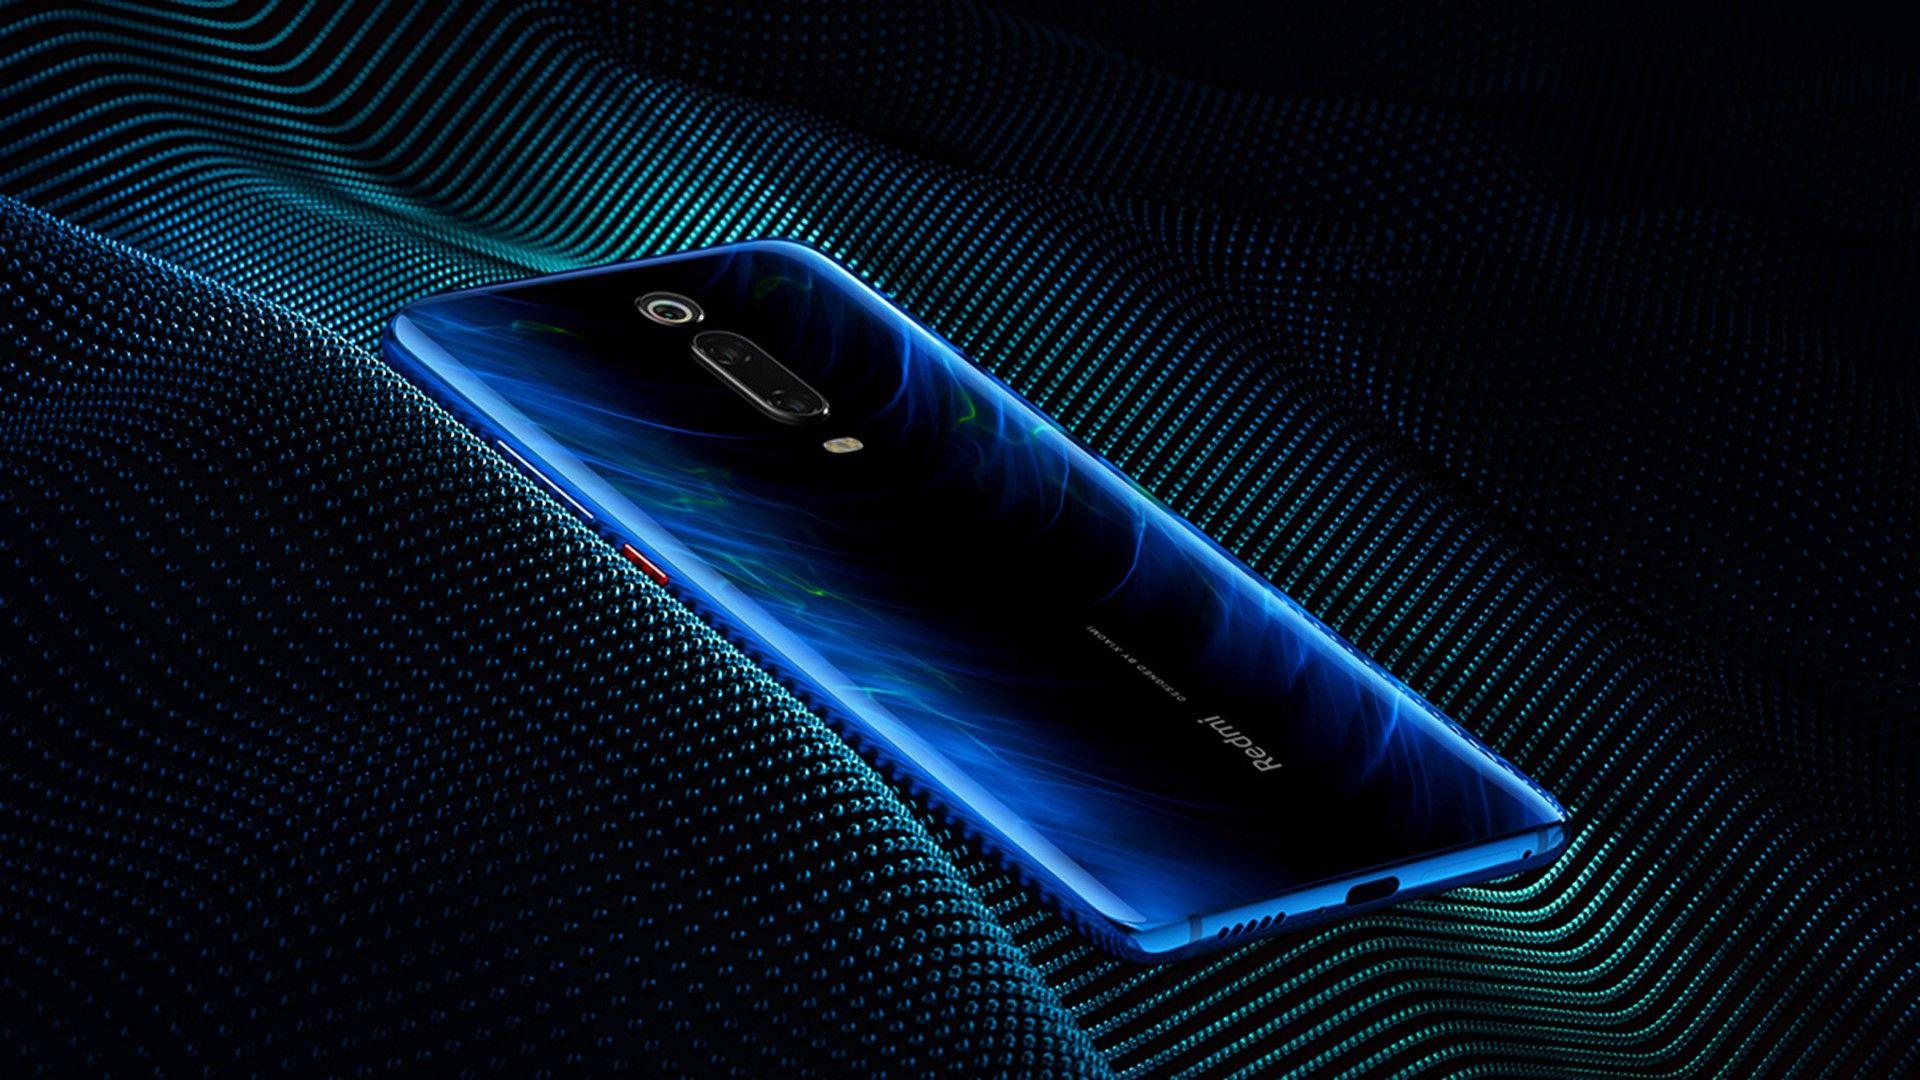 Xiaomi Says The Redmi K20 Pro With 388 803 Antutu Score Is